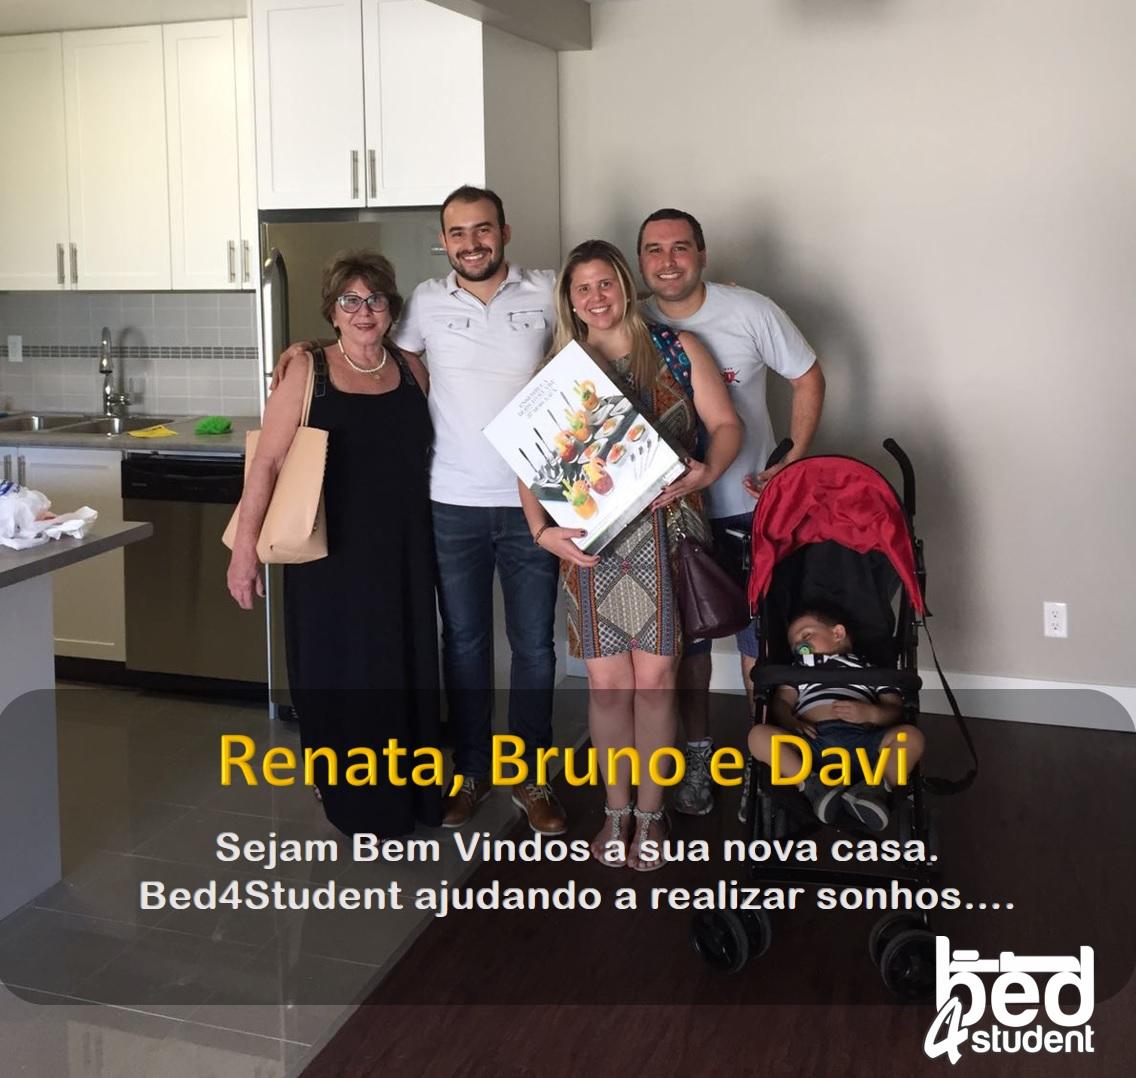 Renata, Bruno e Davi